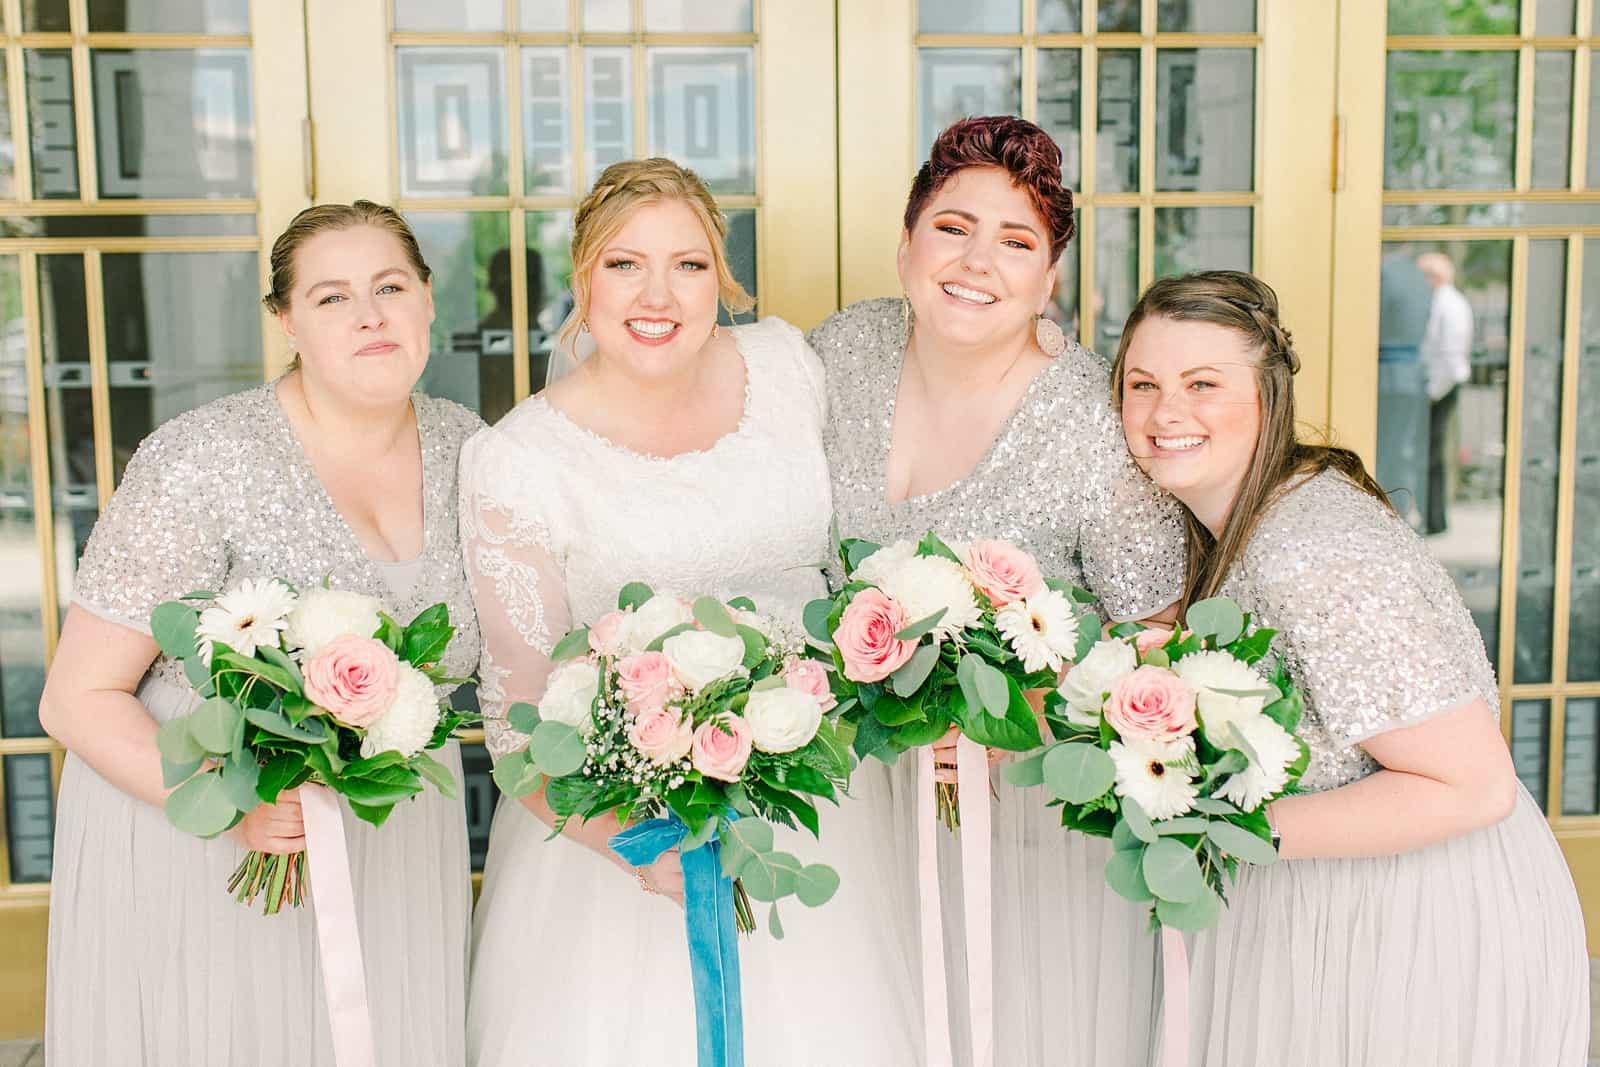 Draper LDS Temple Wedding, Utah wedding photography, summer backyard wedding, silver sequin gray bridesmaids dresses